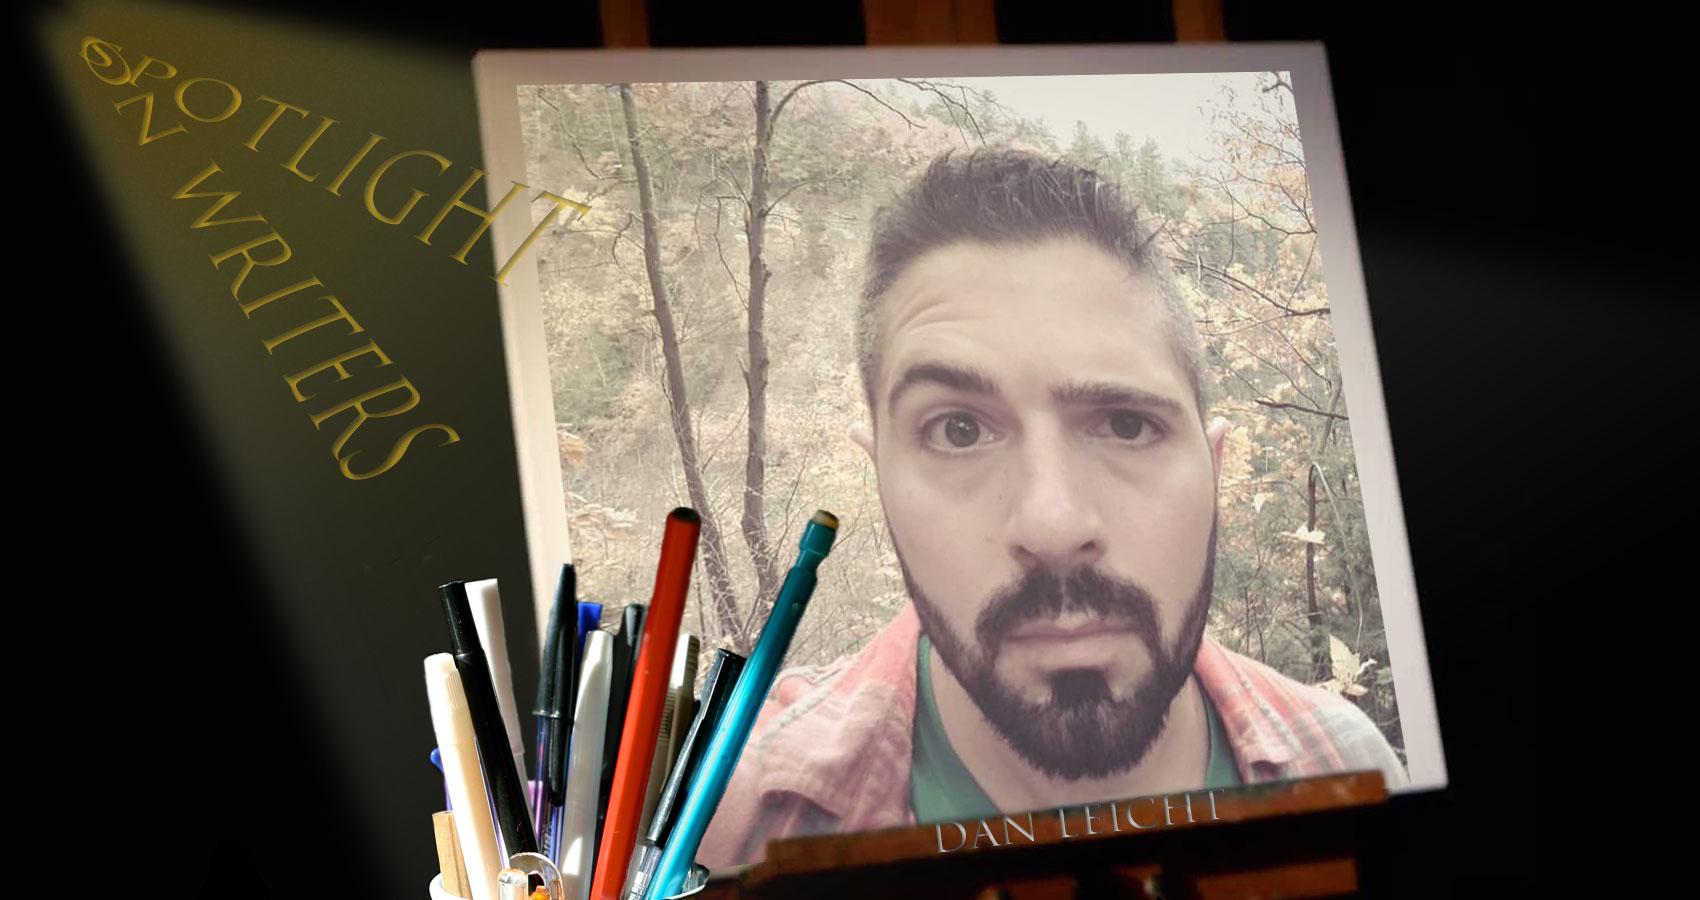 Spotlight On Writers - Dan Leicht at Spillwords.com